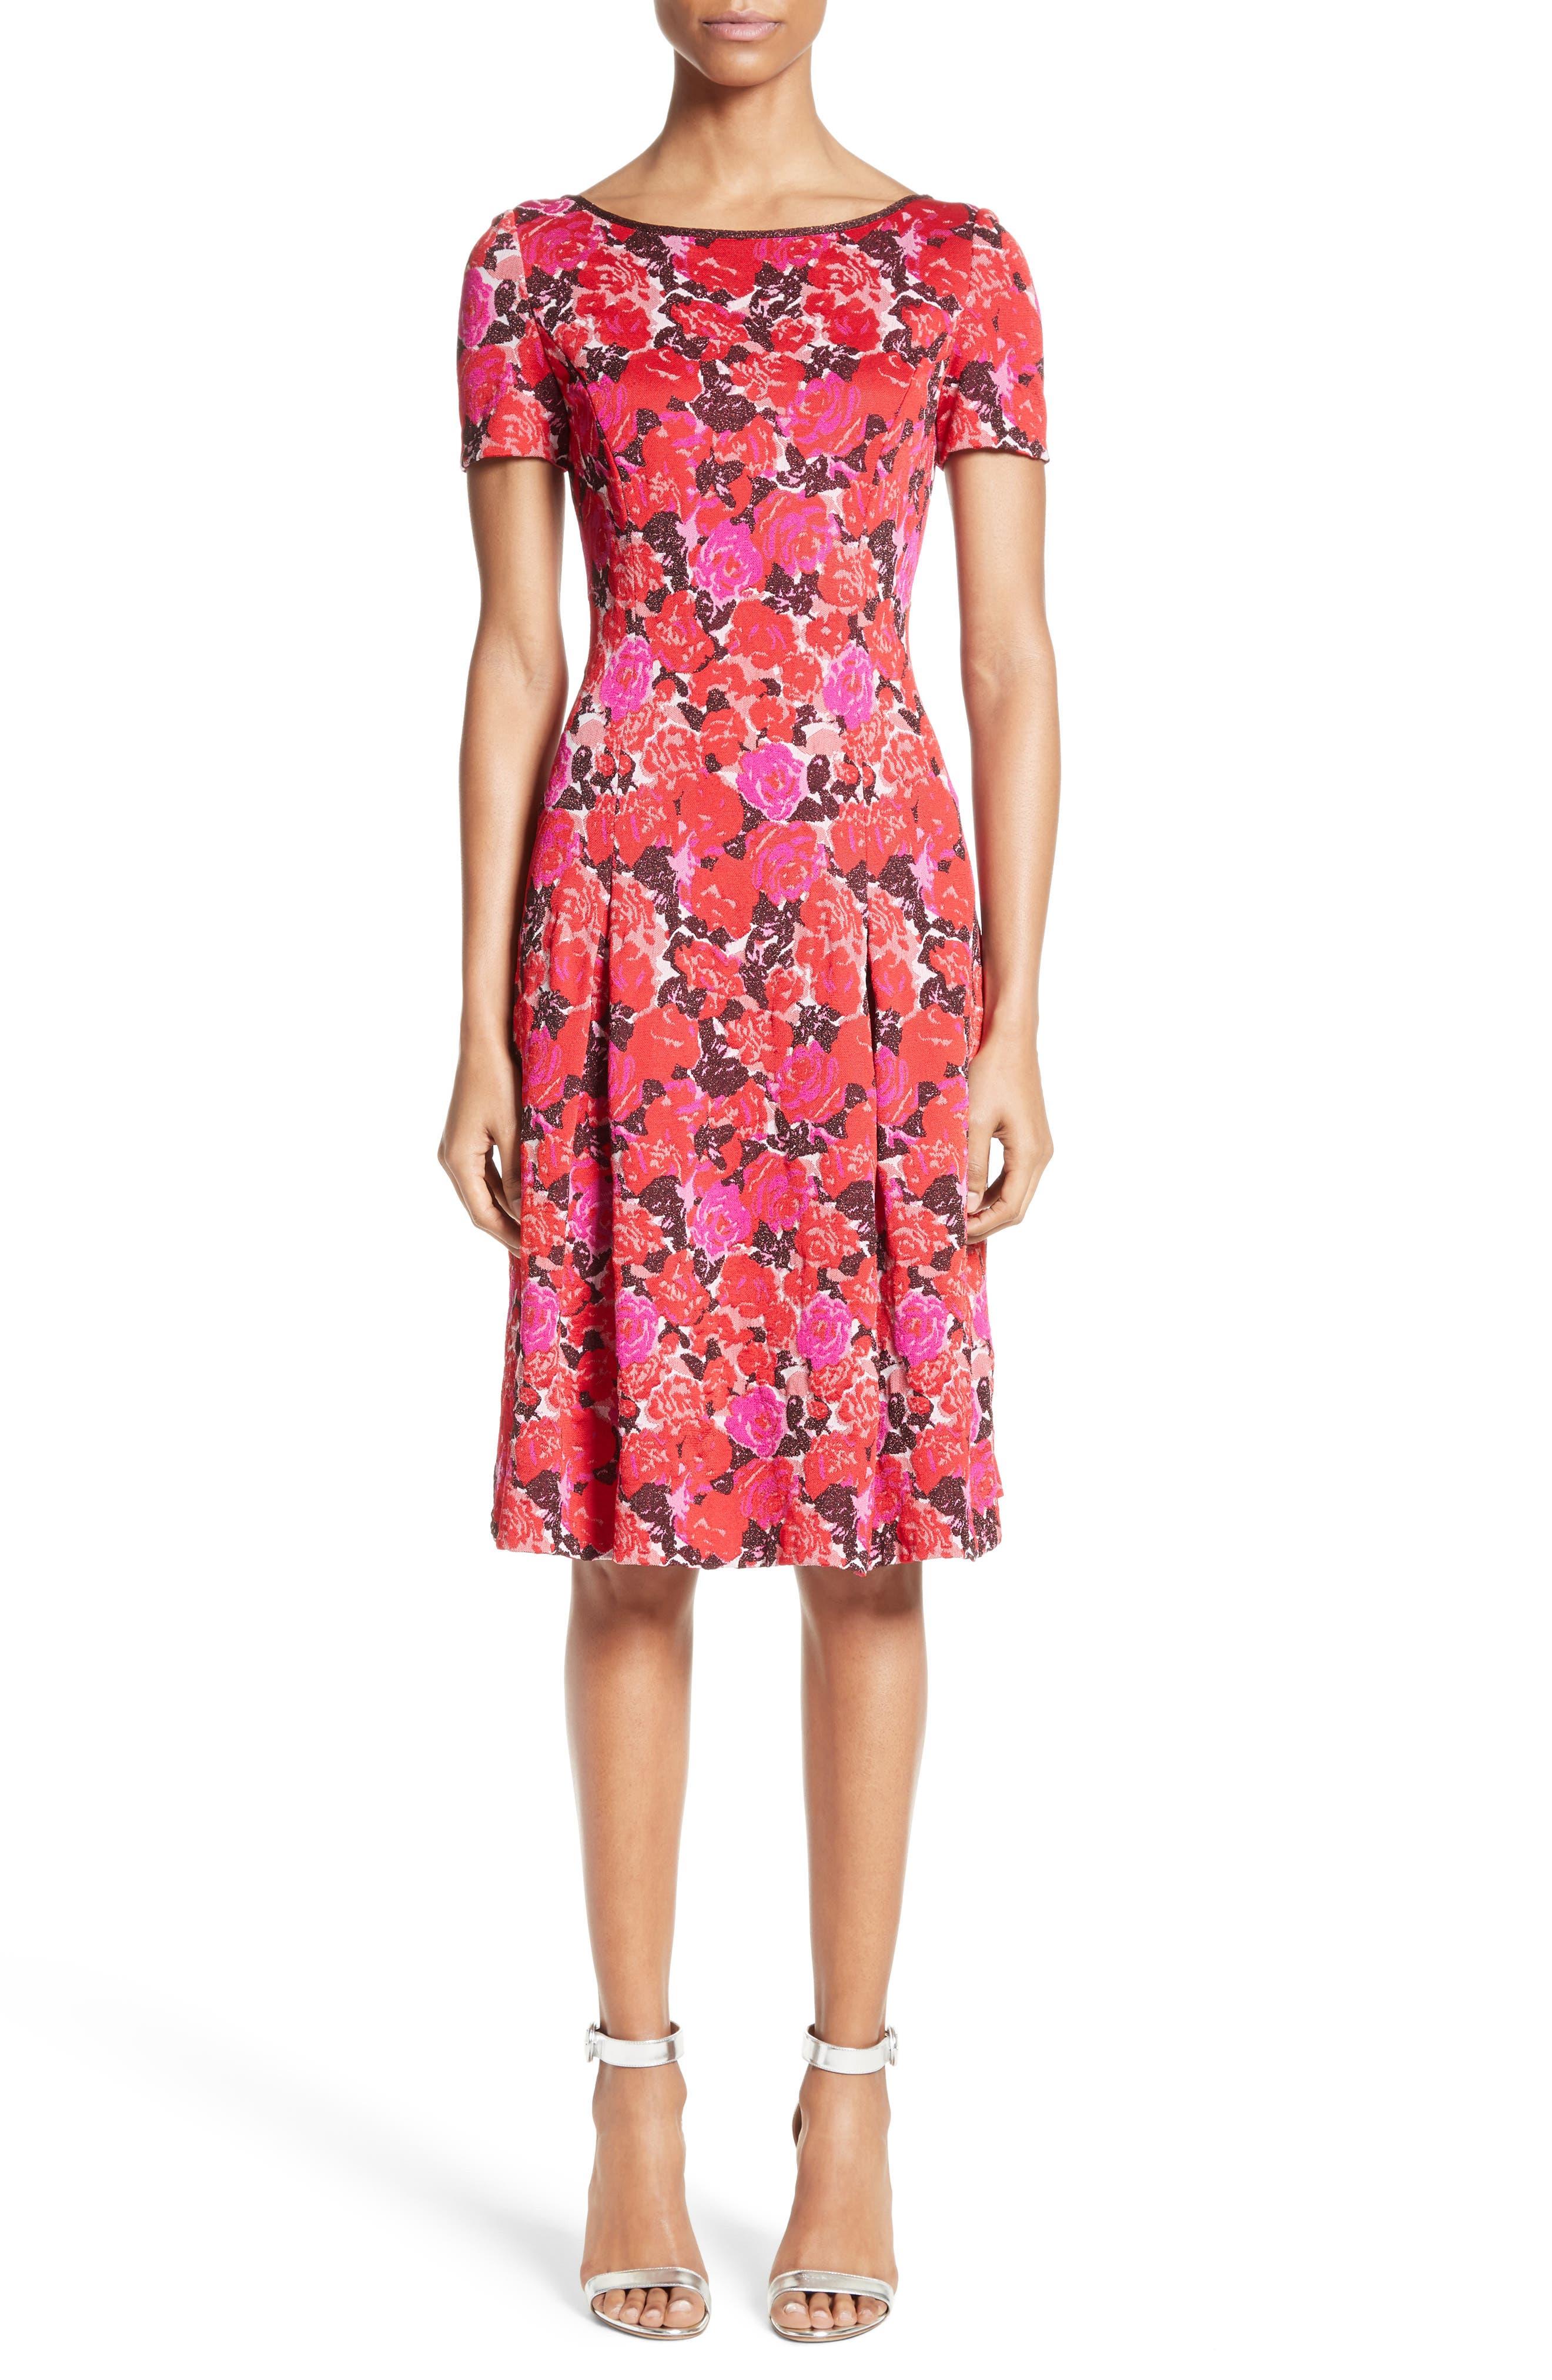 Alternate Image 1 Selected - St. John Collection Indian Rose Blister Jacquard Dress